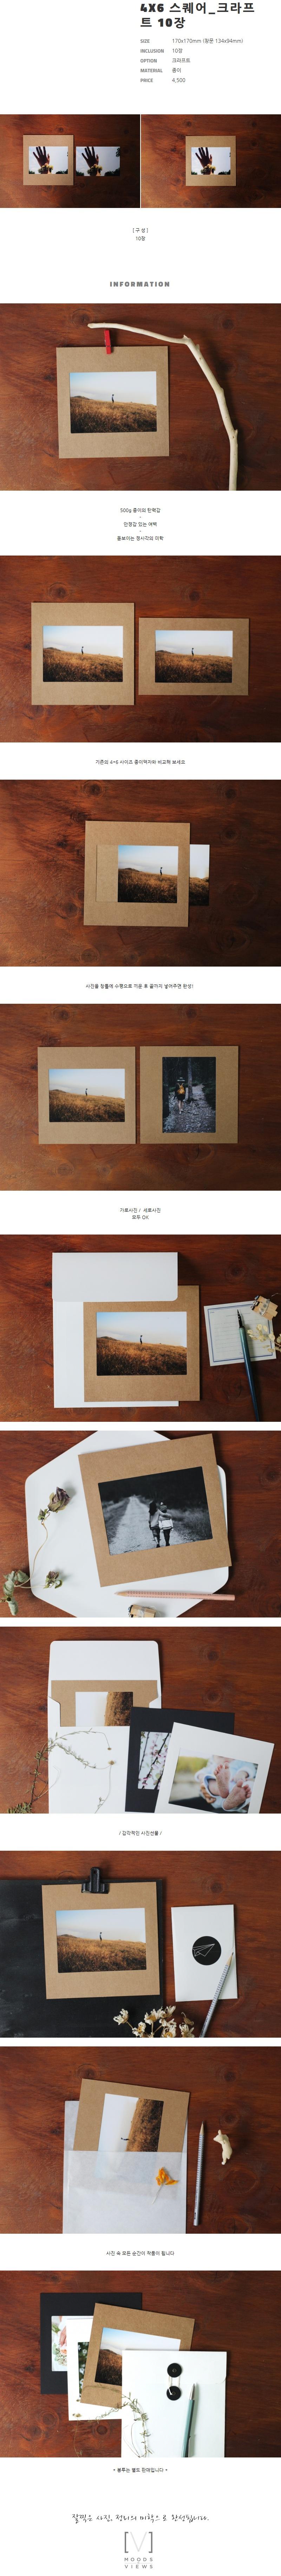 4X6 스퀘어 CRAFT 10장 - 무즈앤뷰즈, 4,500원, 테마앨범/테마북, 포토박스/프레임